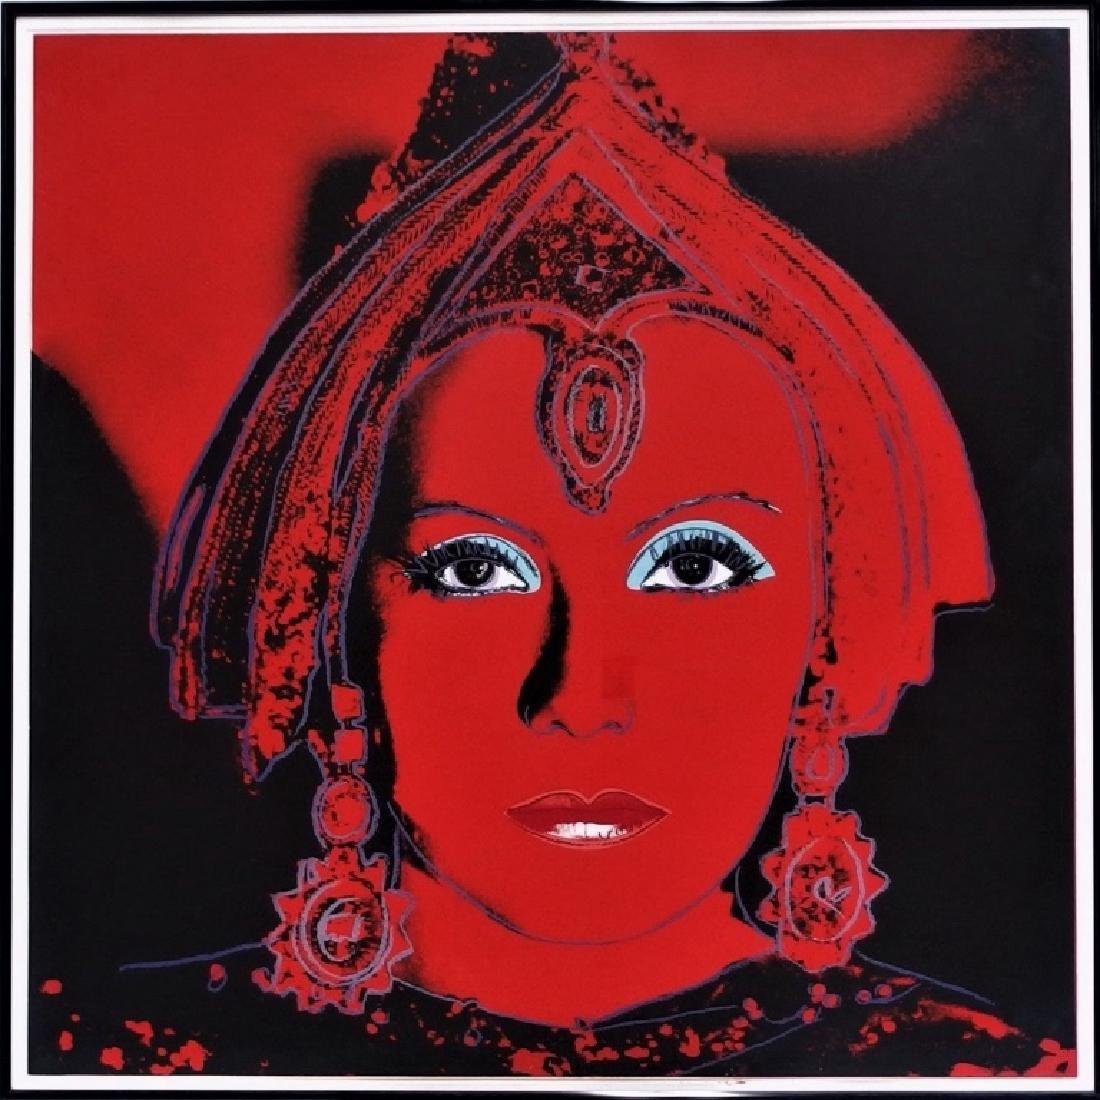 Andy Warhol Myths Portfolio The Star Screenprint